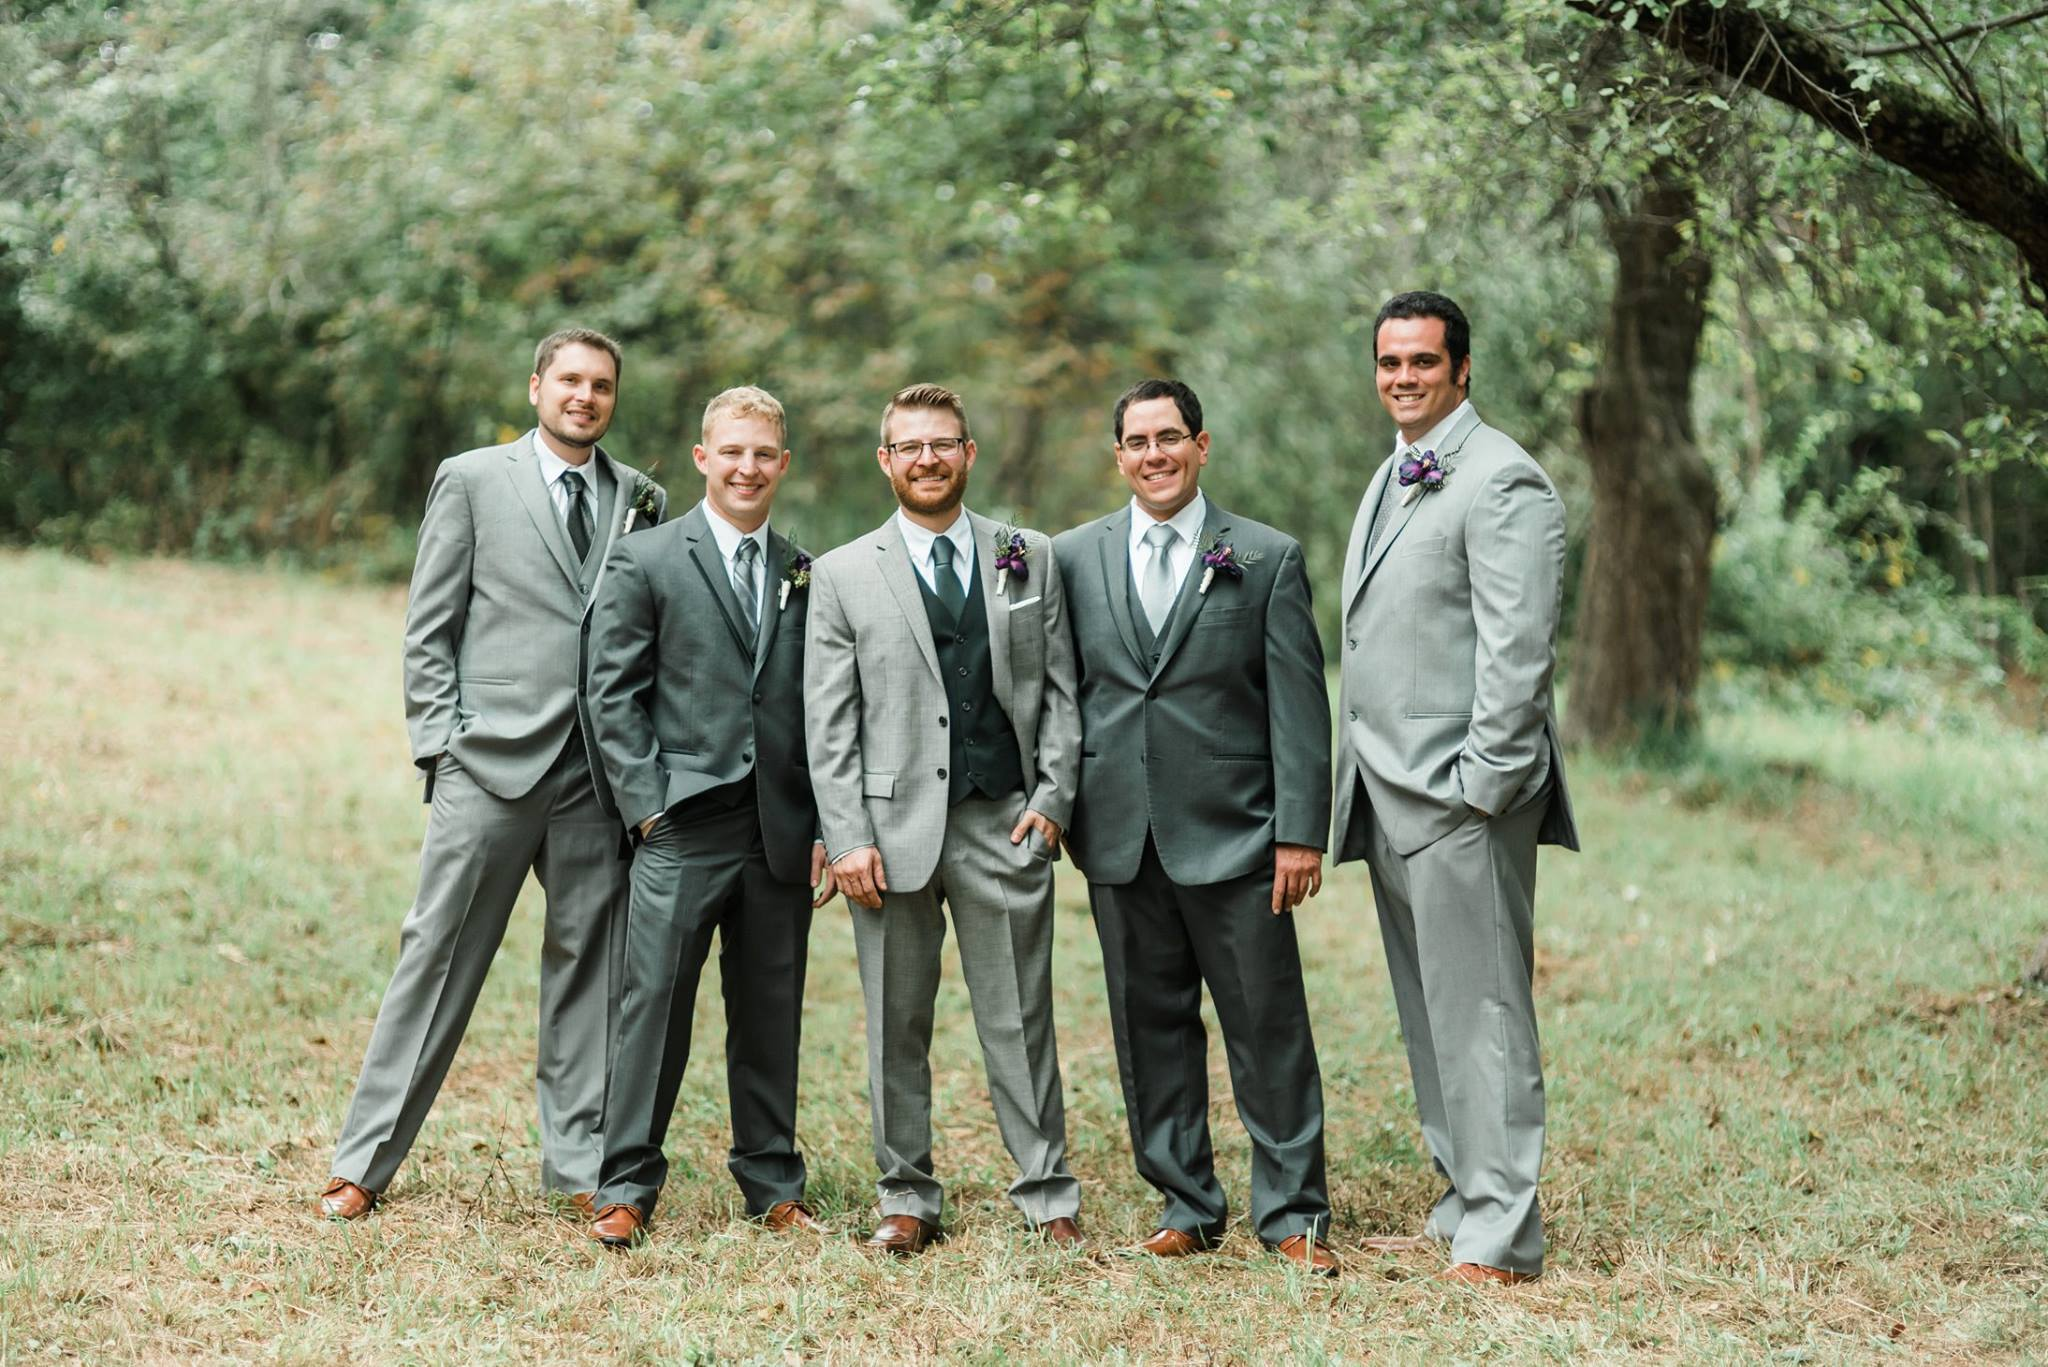 pennsylvania-backyard-wedding-love-diy-bohemian-romantic-colorful-0015.jpg